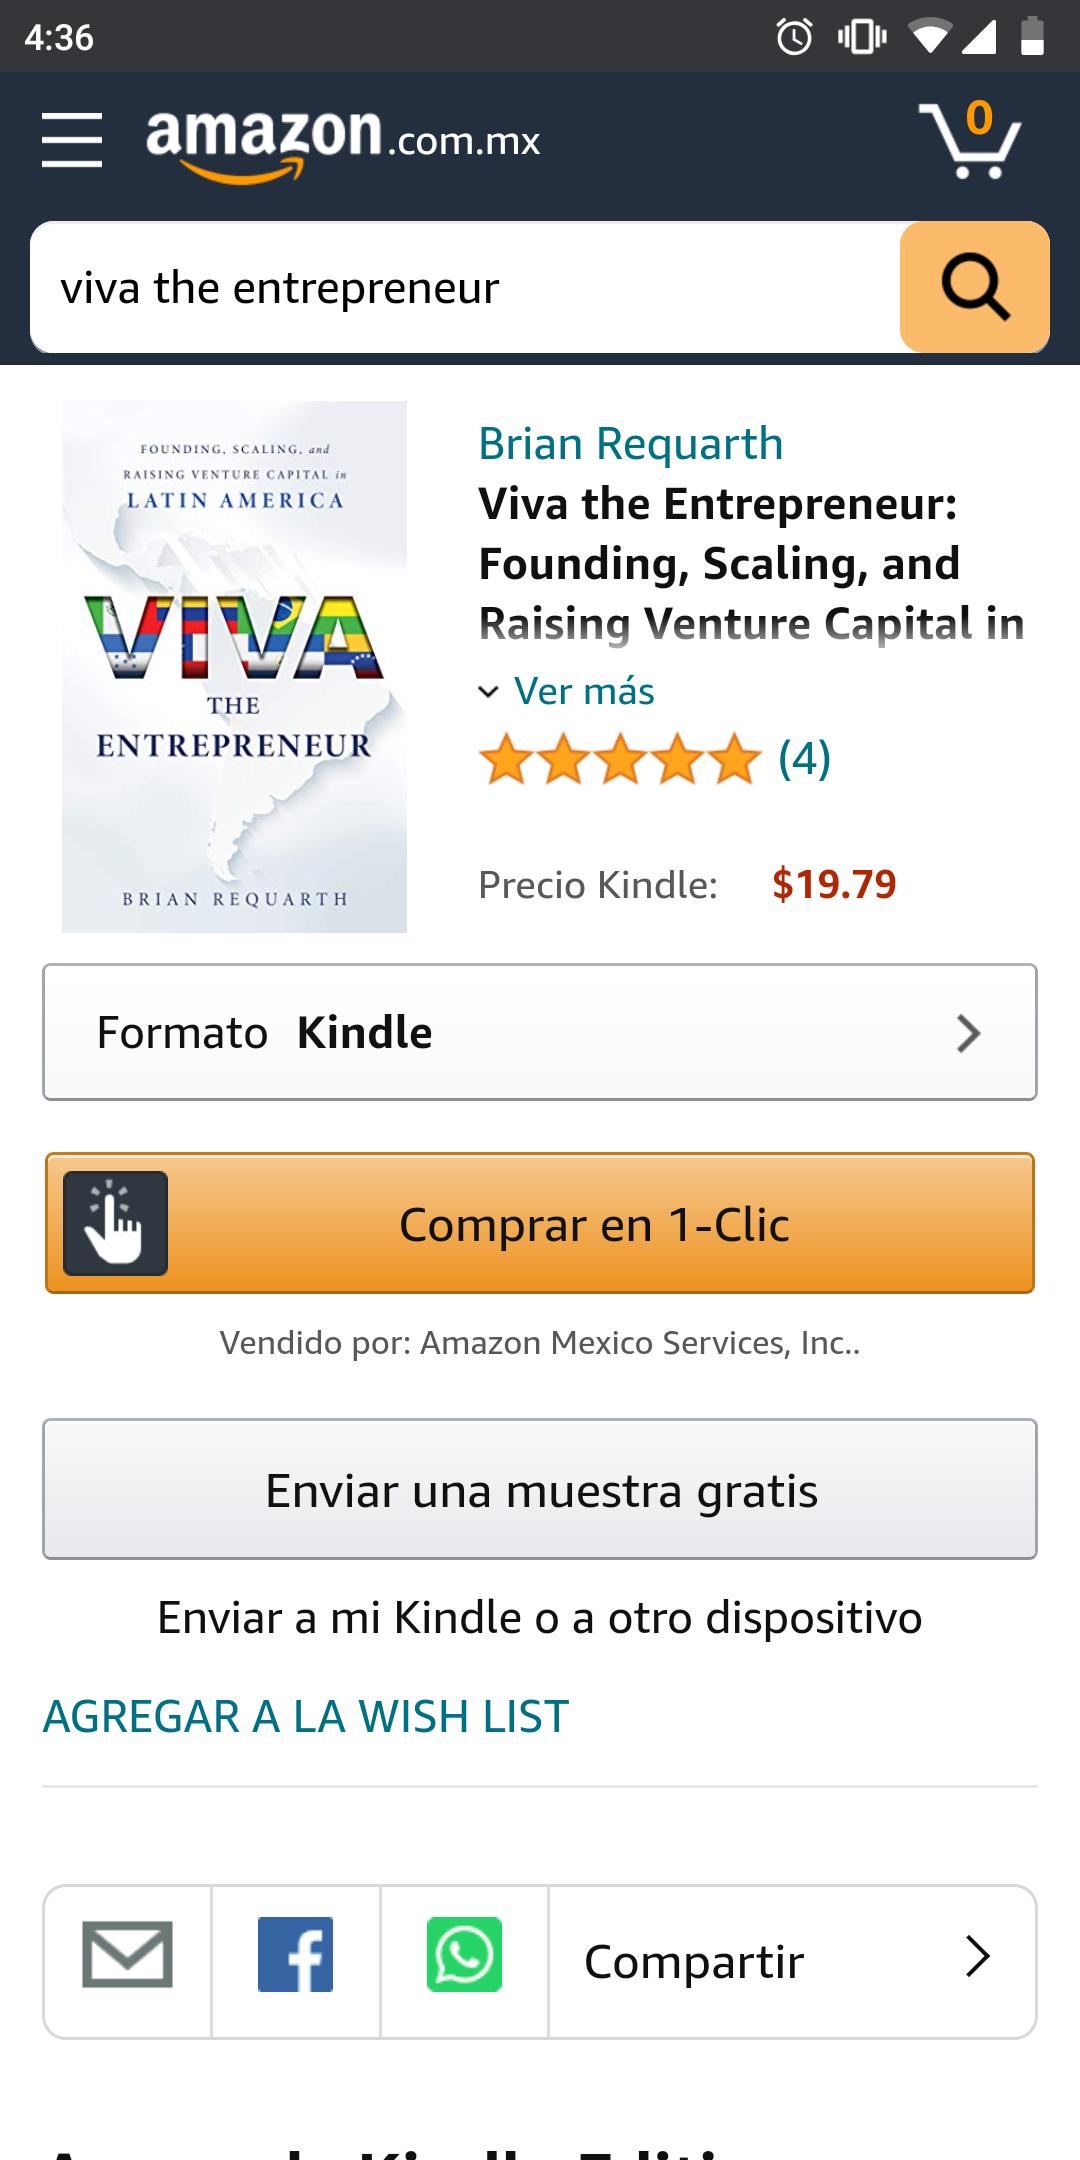 Amazon: Viva the Entrepreneur: Founding, Scaling, and Raising Venture Capital in Latin America (English Edition)